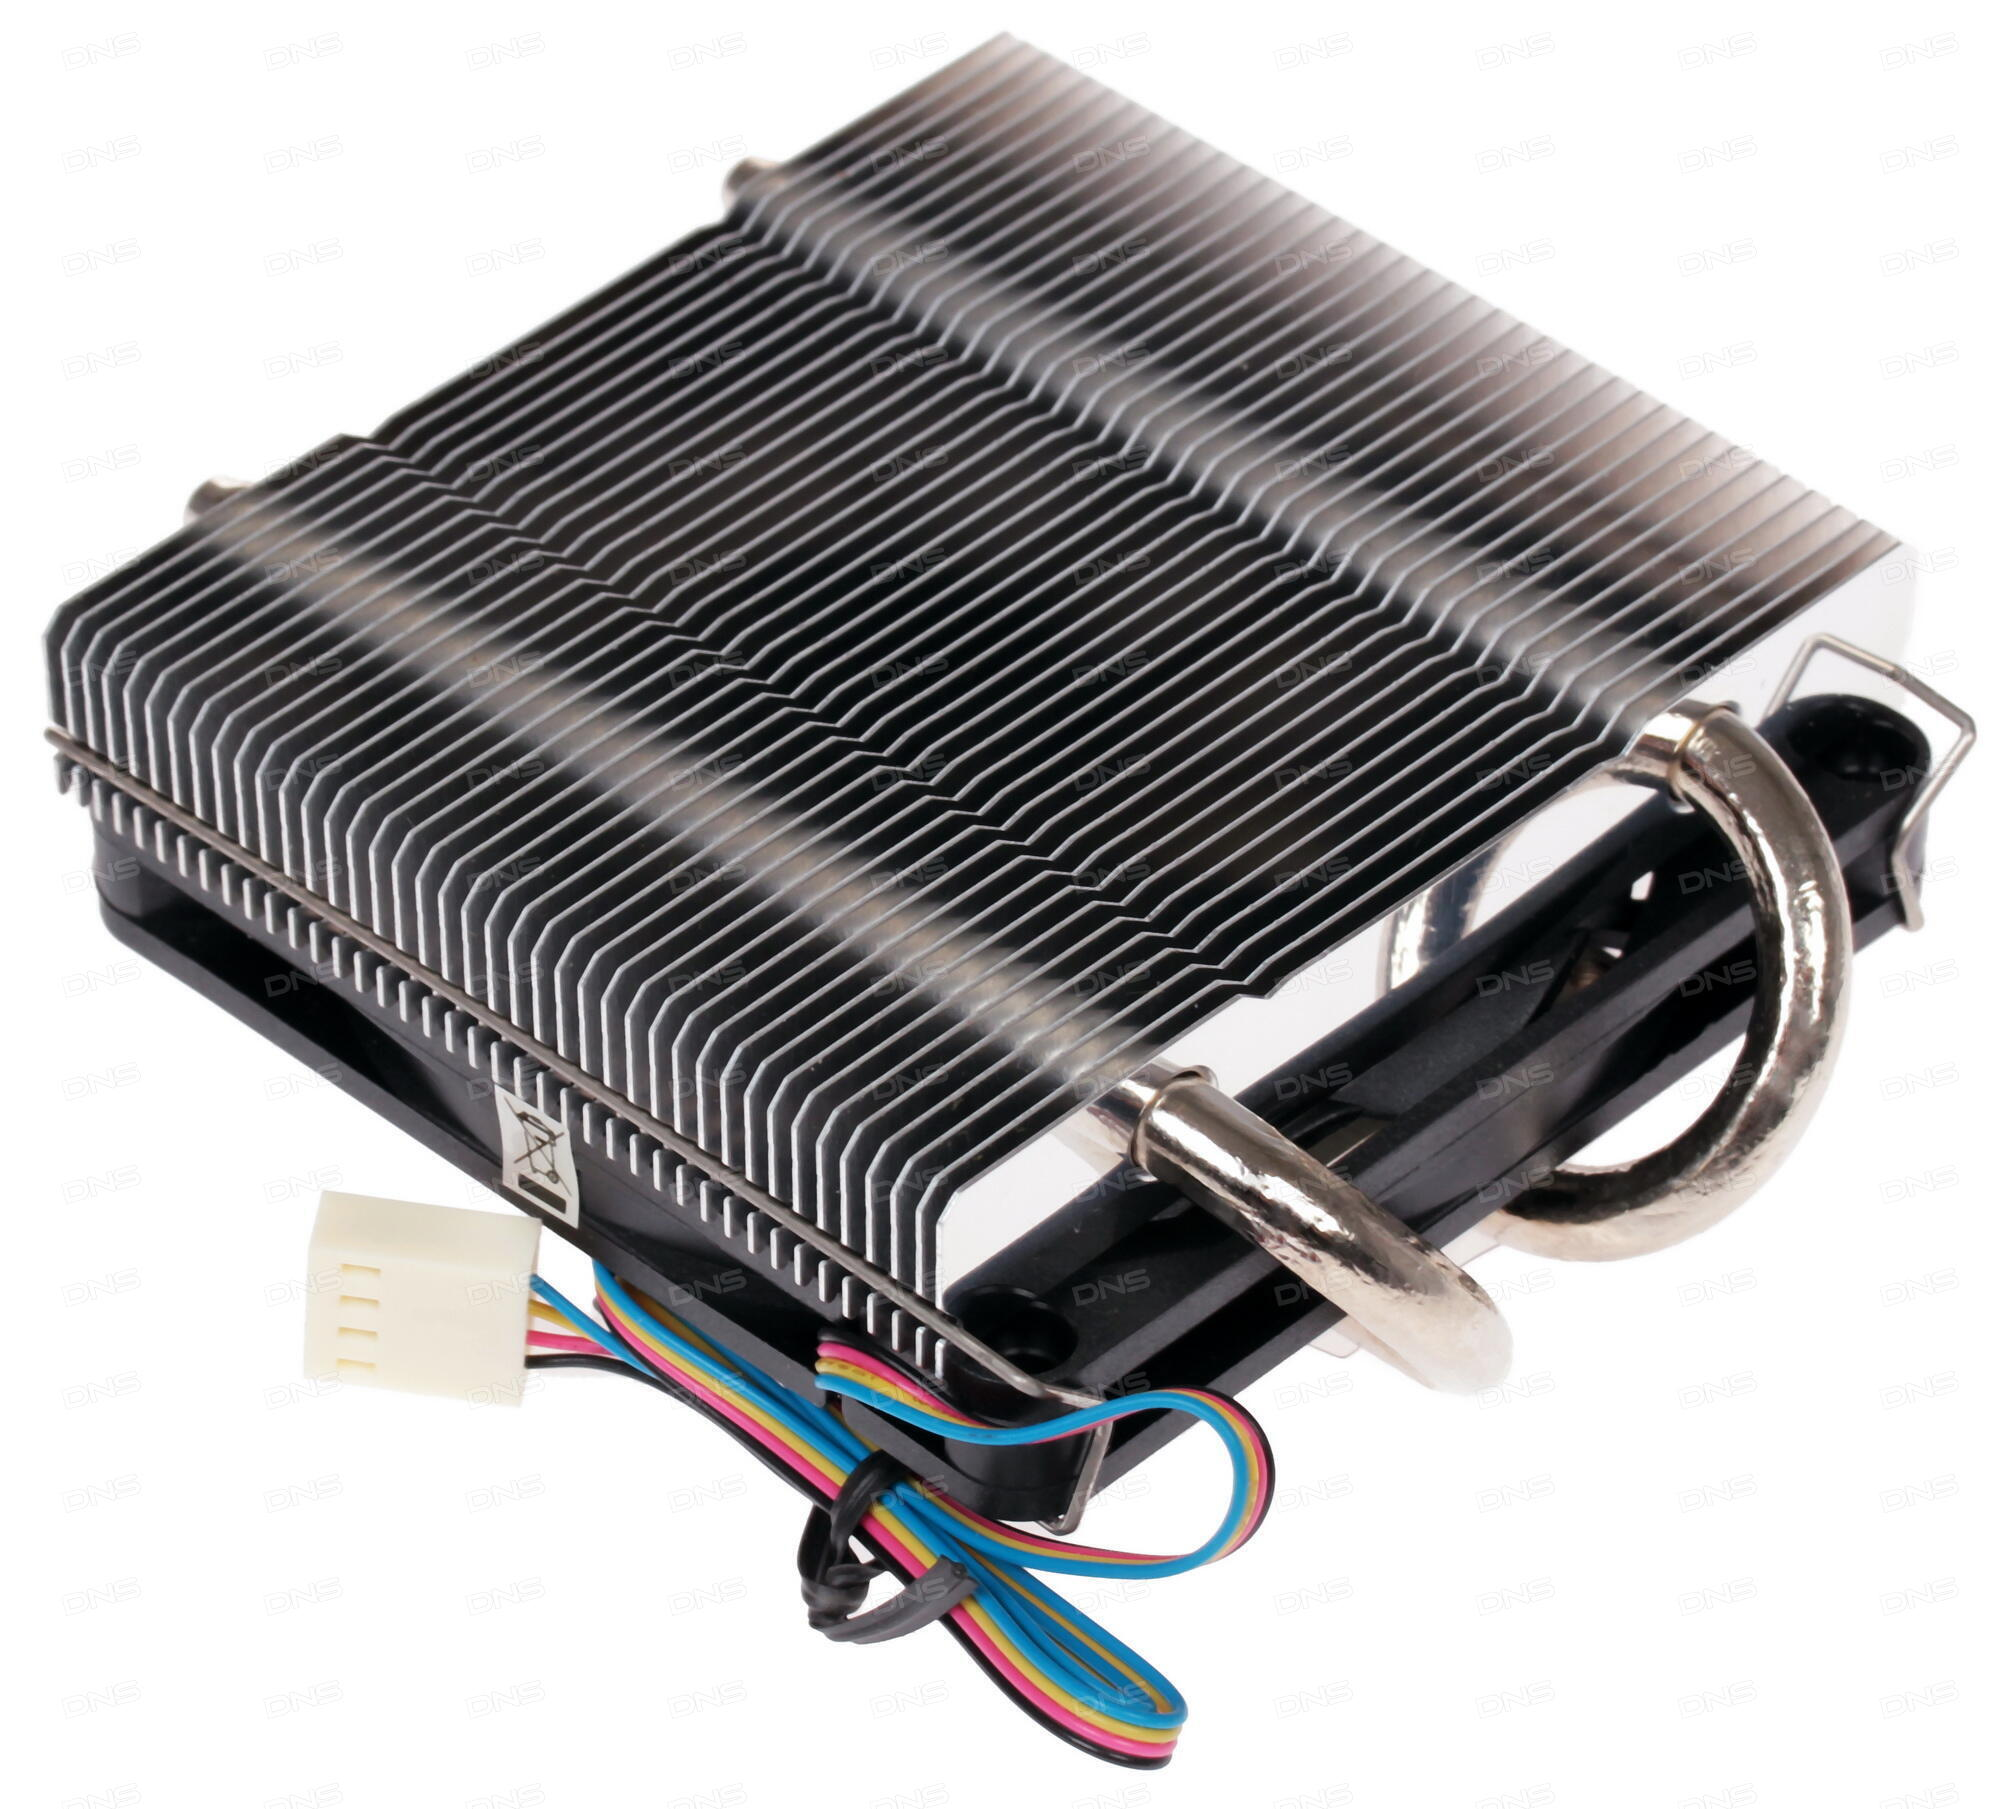 Кулер для процессора Cooler Master for AMD DK9-7G52A-0L-GP